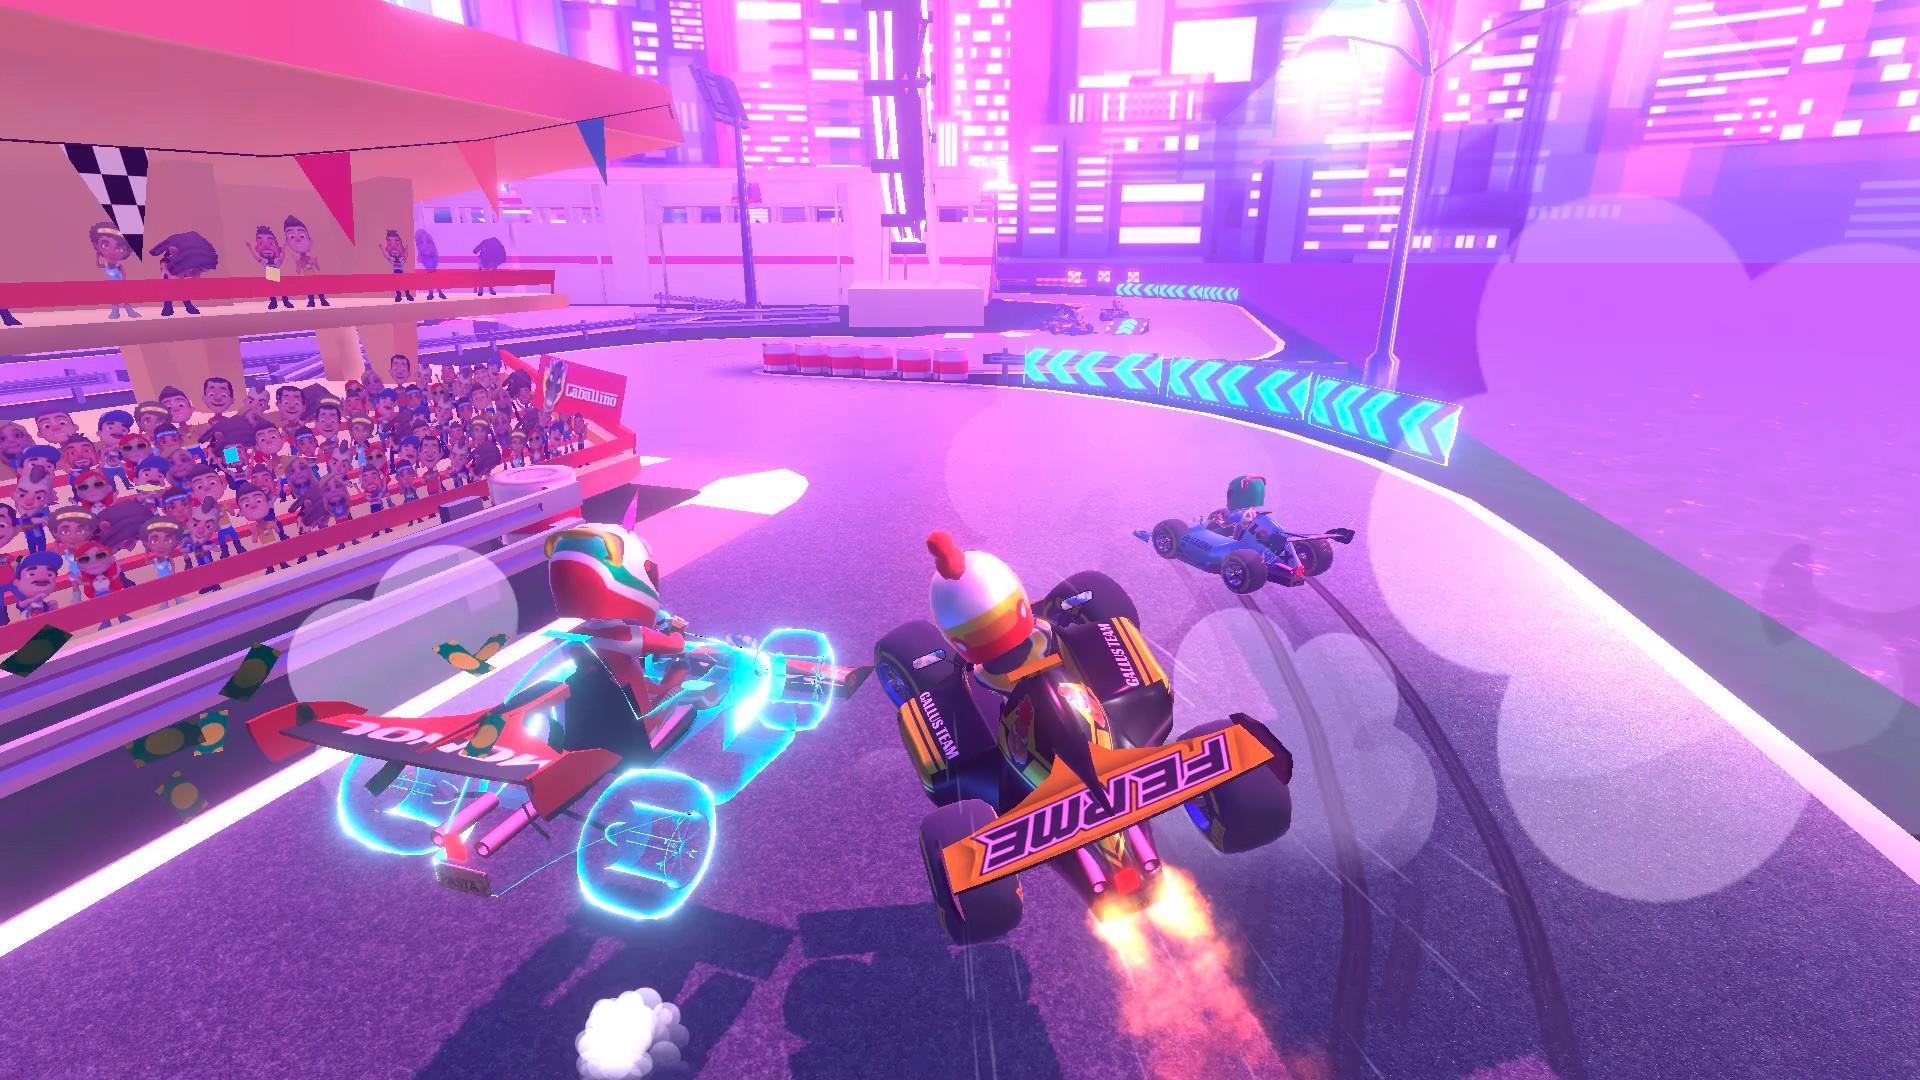 Oculus Quest 游戏《Touring Karts》疯狂卡丁车插图(3)